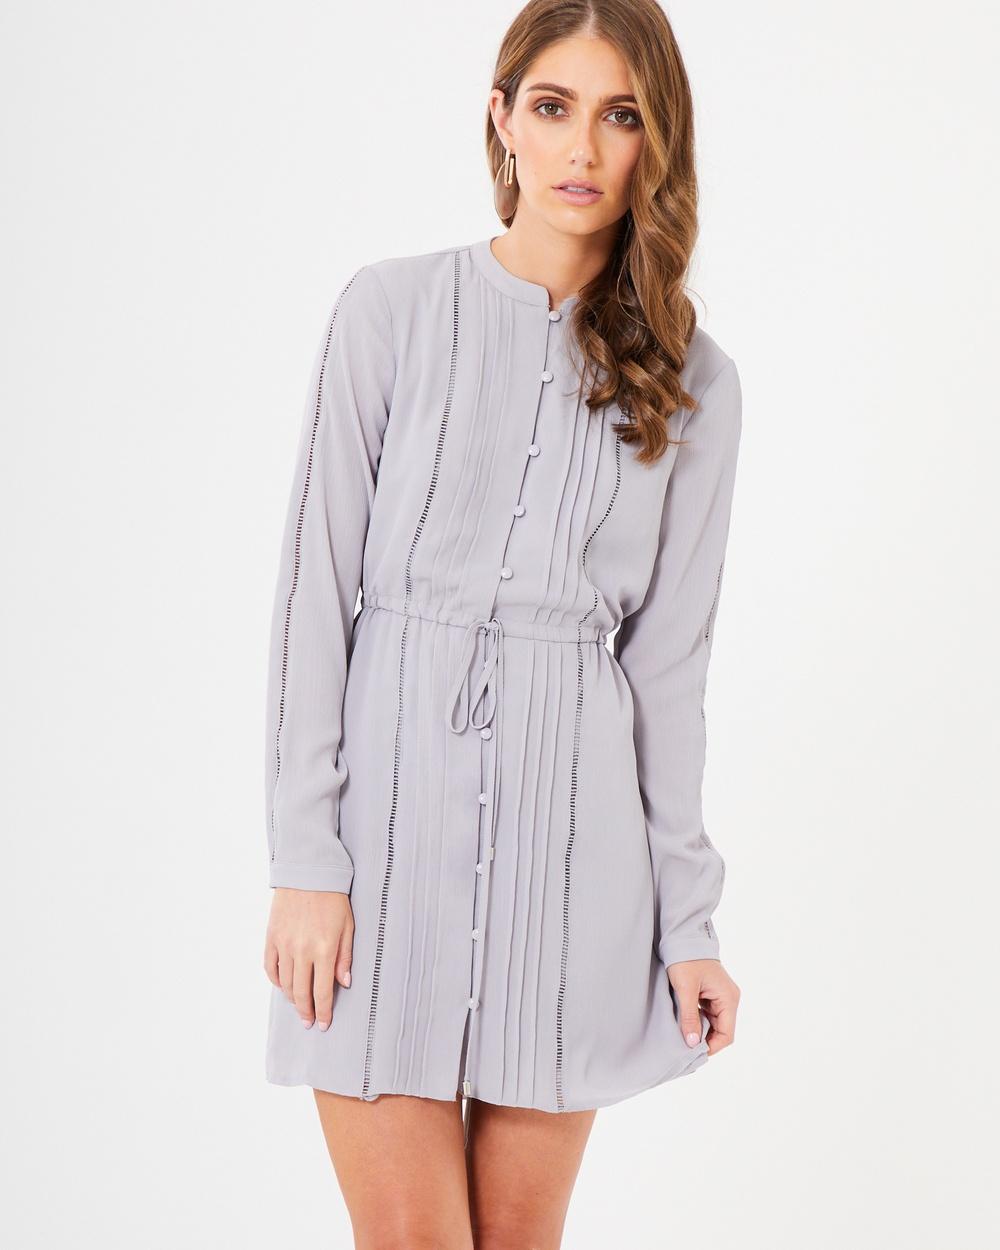 CHANCERY Keira Shirt Dress Dresses Grey Keira Shirt Dress